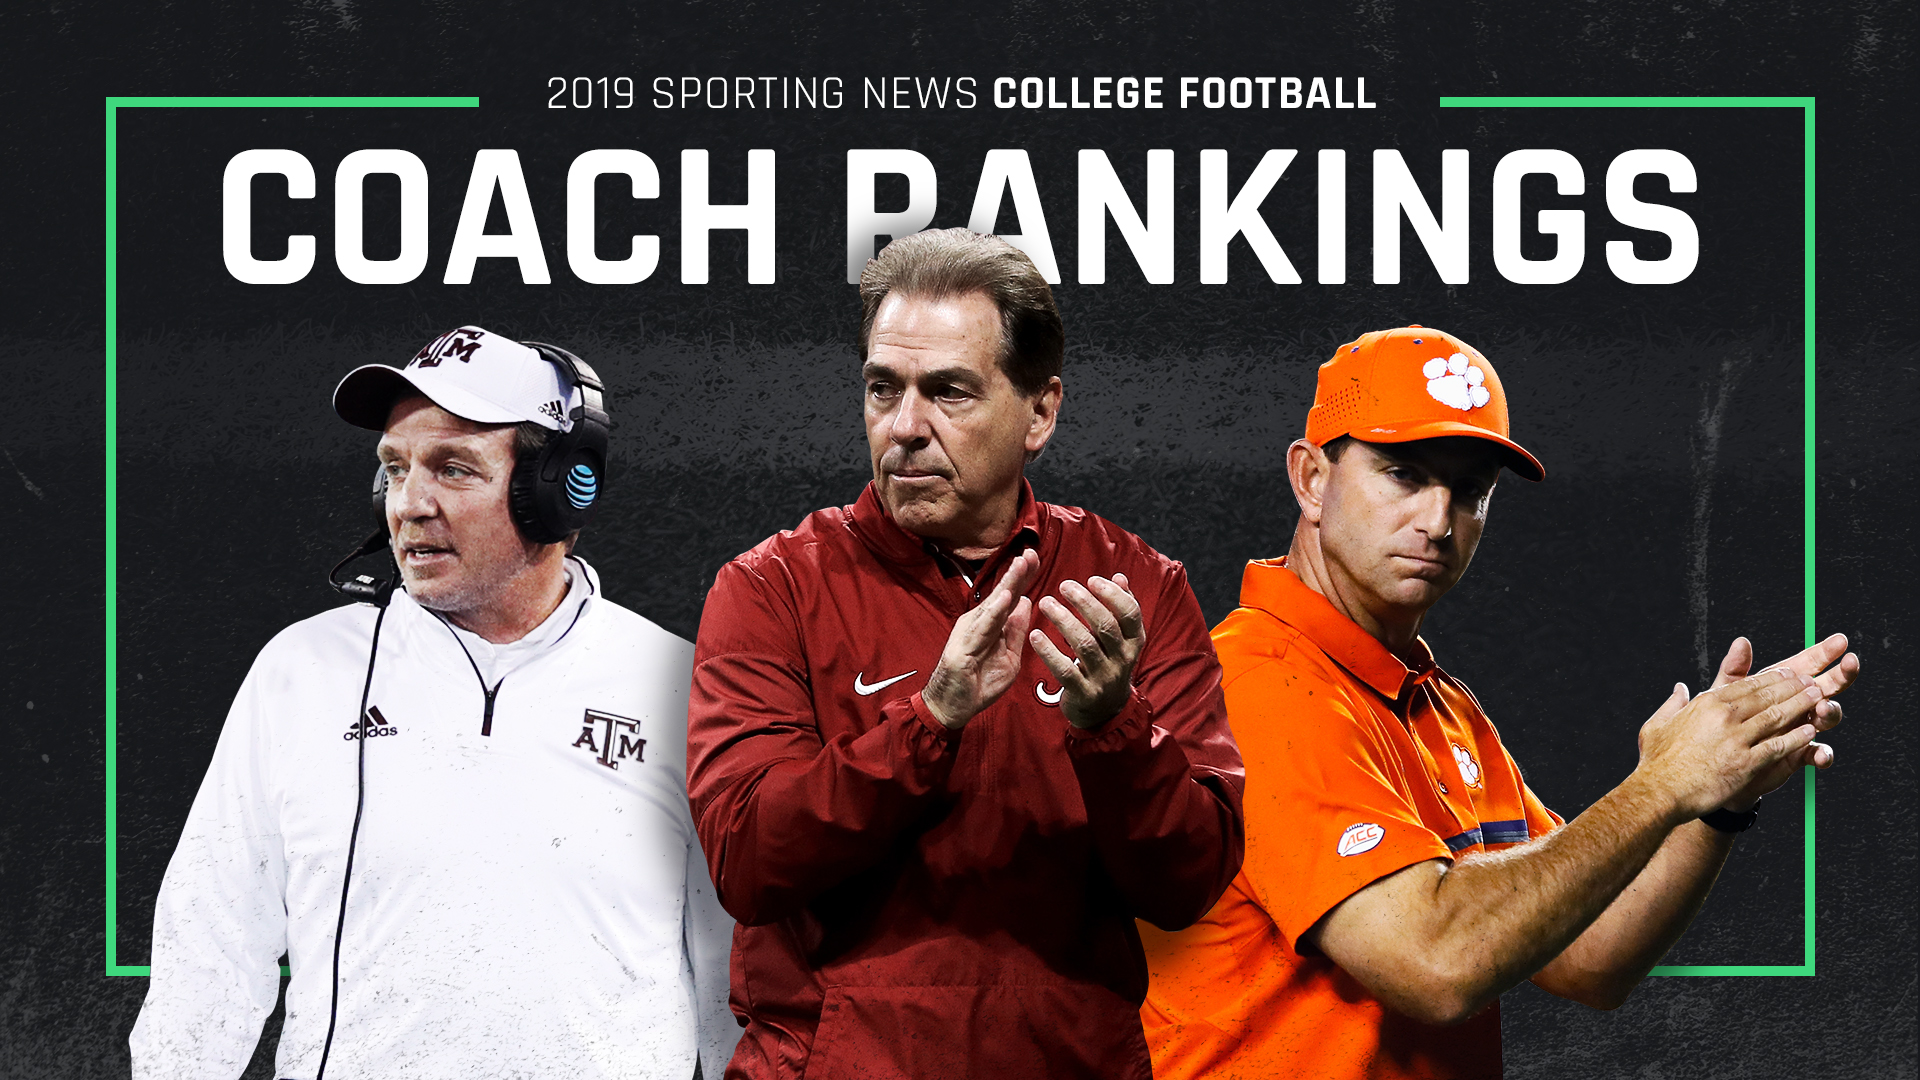 College football 2019 coach rankings: Nick Saban still No. 1, but Dabo Swinney closing gap